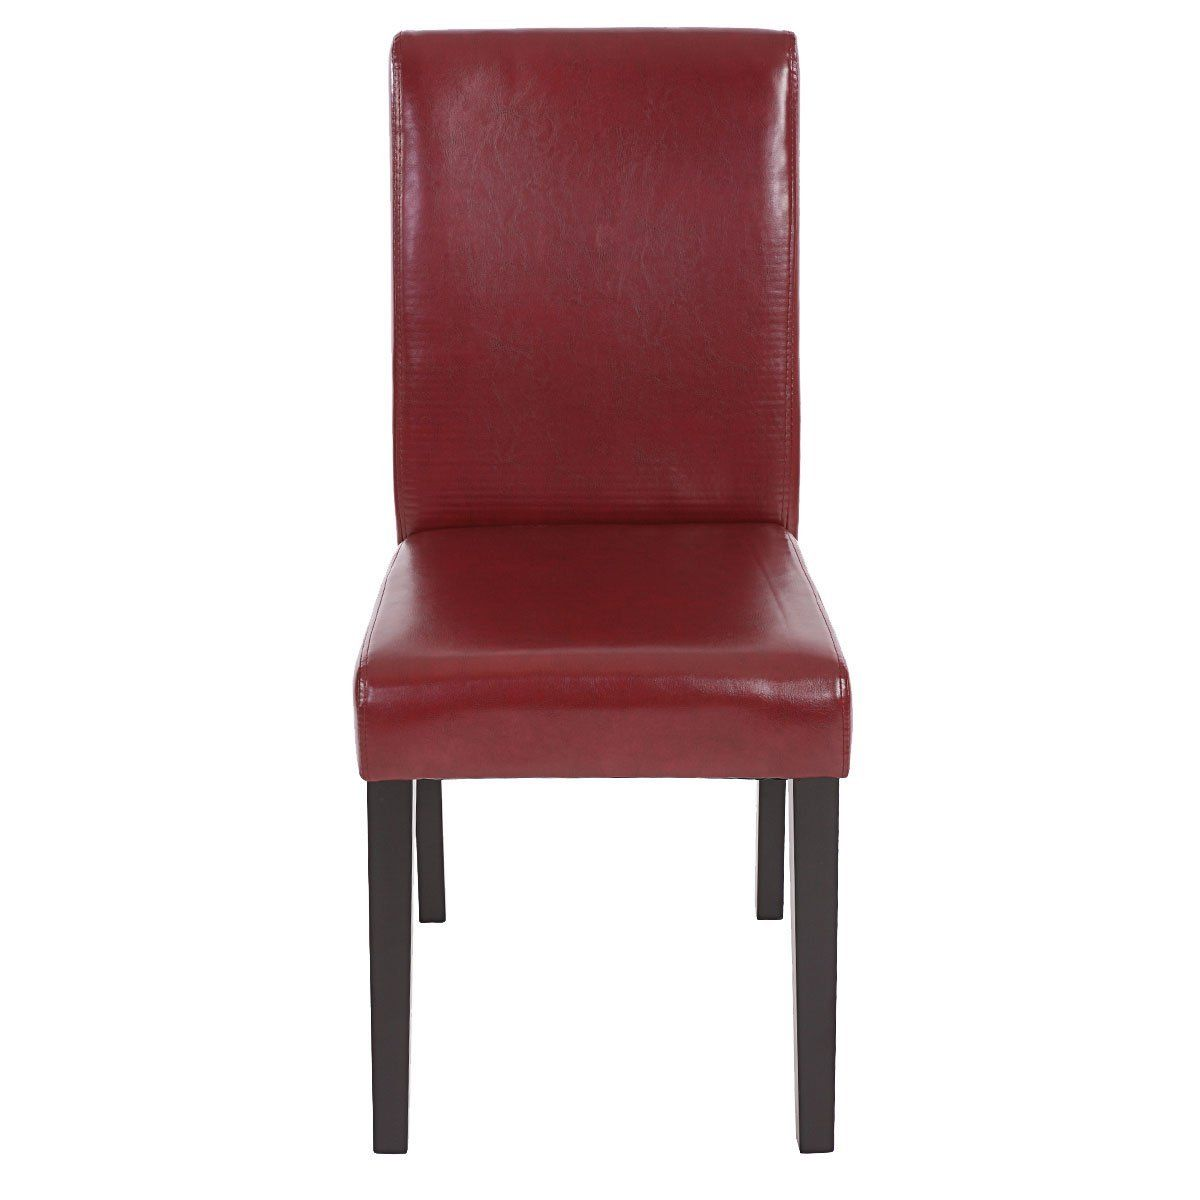 2x Esszimmerstuhl Stuhl Küchenstuhl Lehnstuhl Polsterstuhl Kunstleder braun